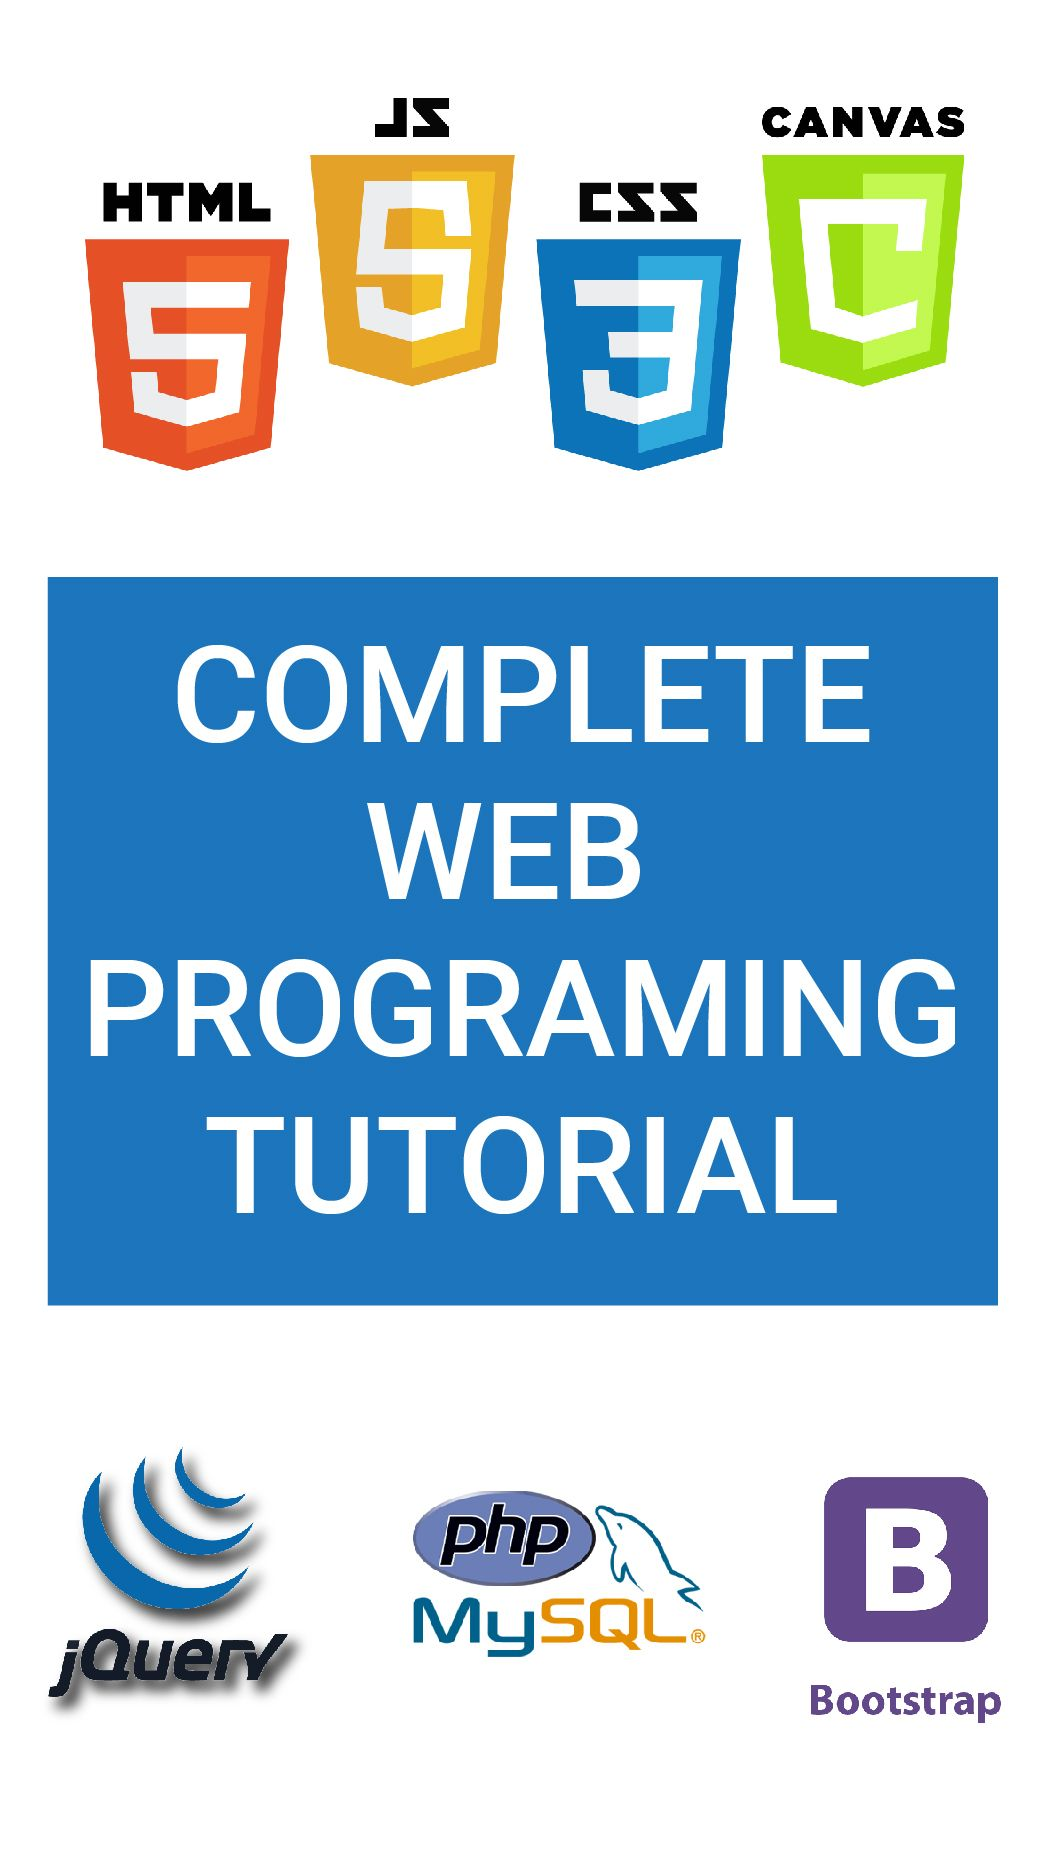 Simple web app go lang practical programming tutorial p. 5 youtube.